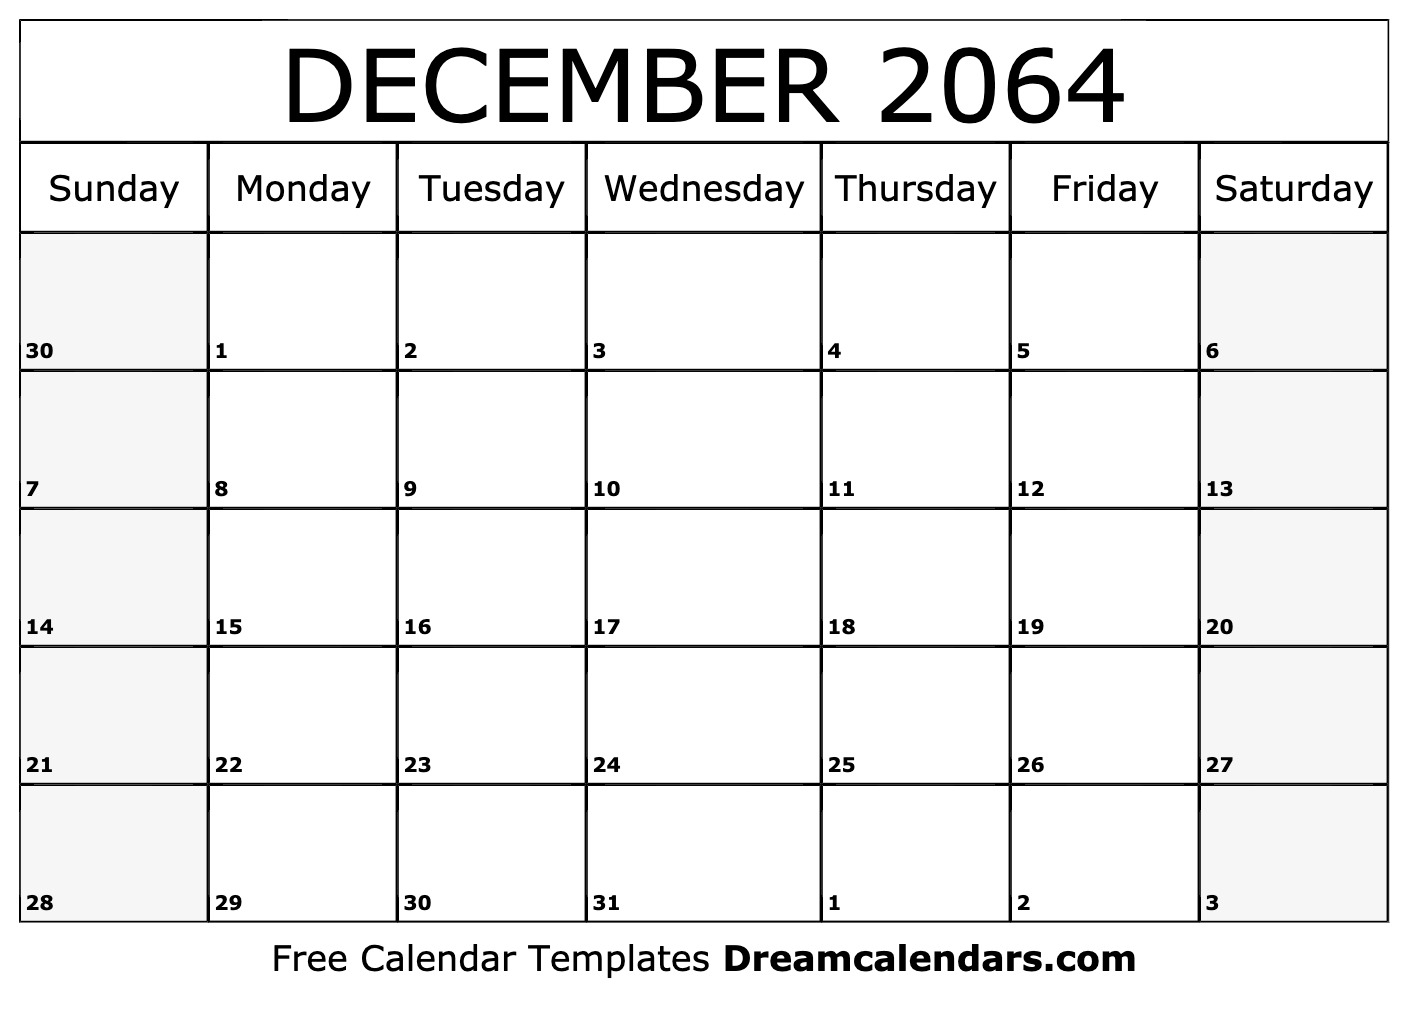 Printable Calendar November 2020 Wincalendar | Month inside Wincalendar Calendar Maker